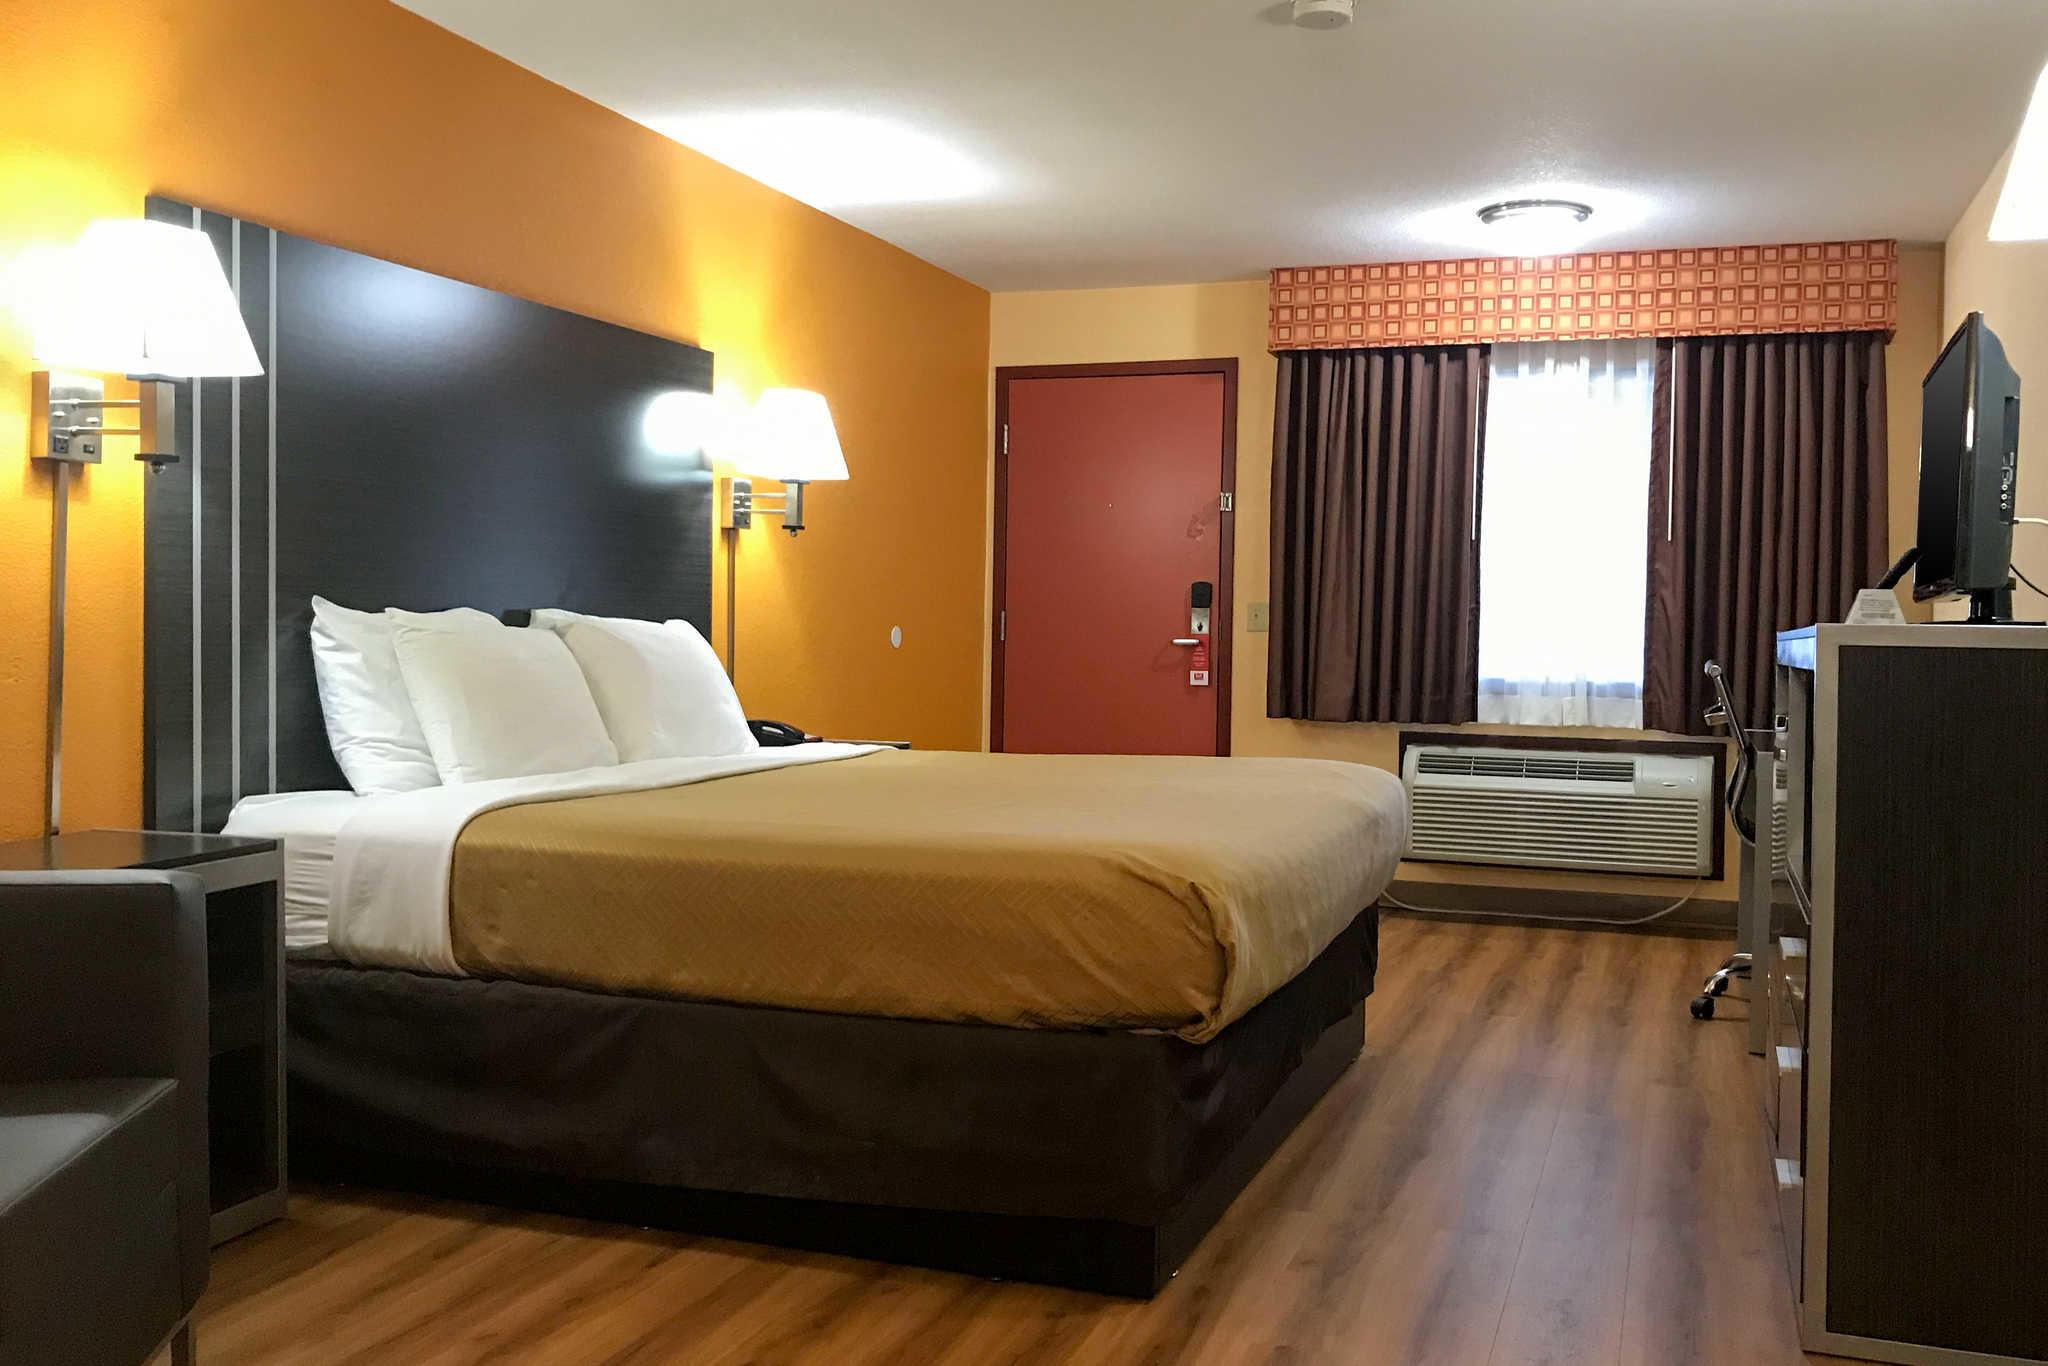 Econo Lodge image 6